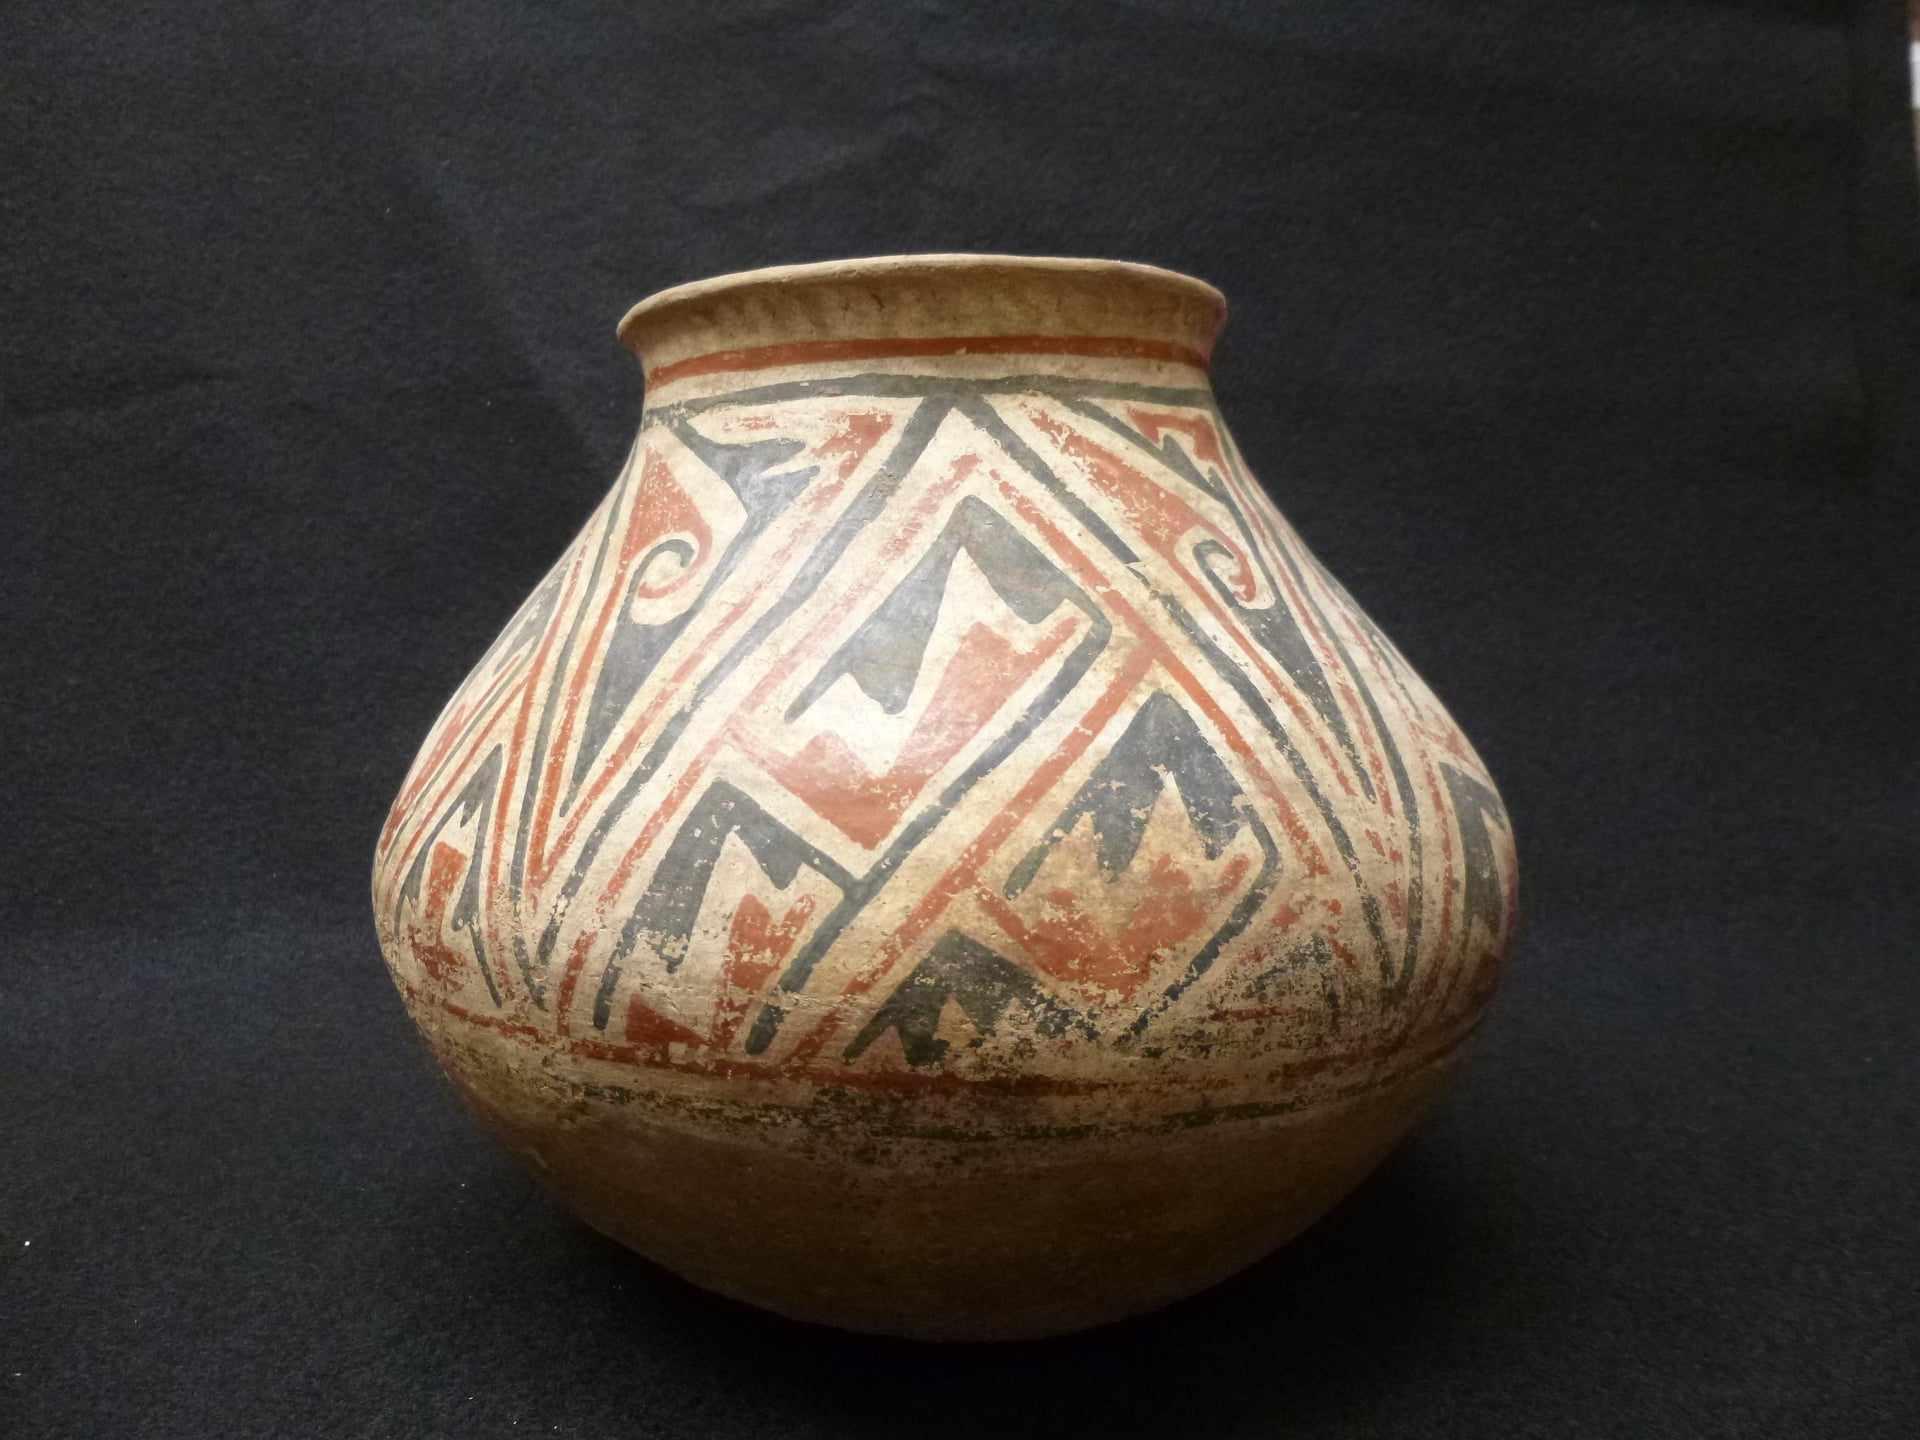 Villa Ahumada Polychrome olla. Casas Grandes Culture, Medio Period AD 1200-1450. Collection of El Paso Museum of Archaeology.